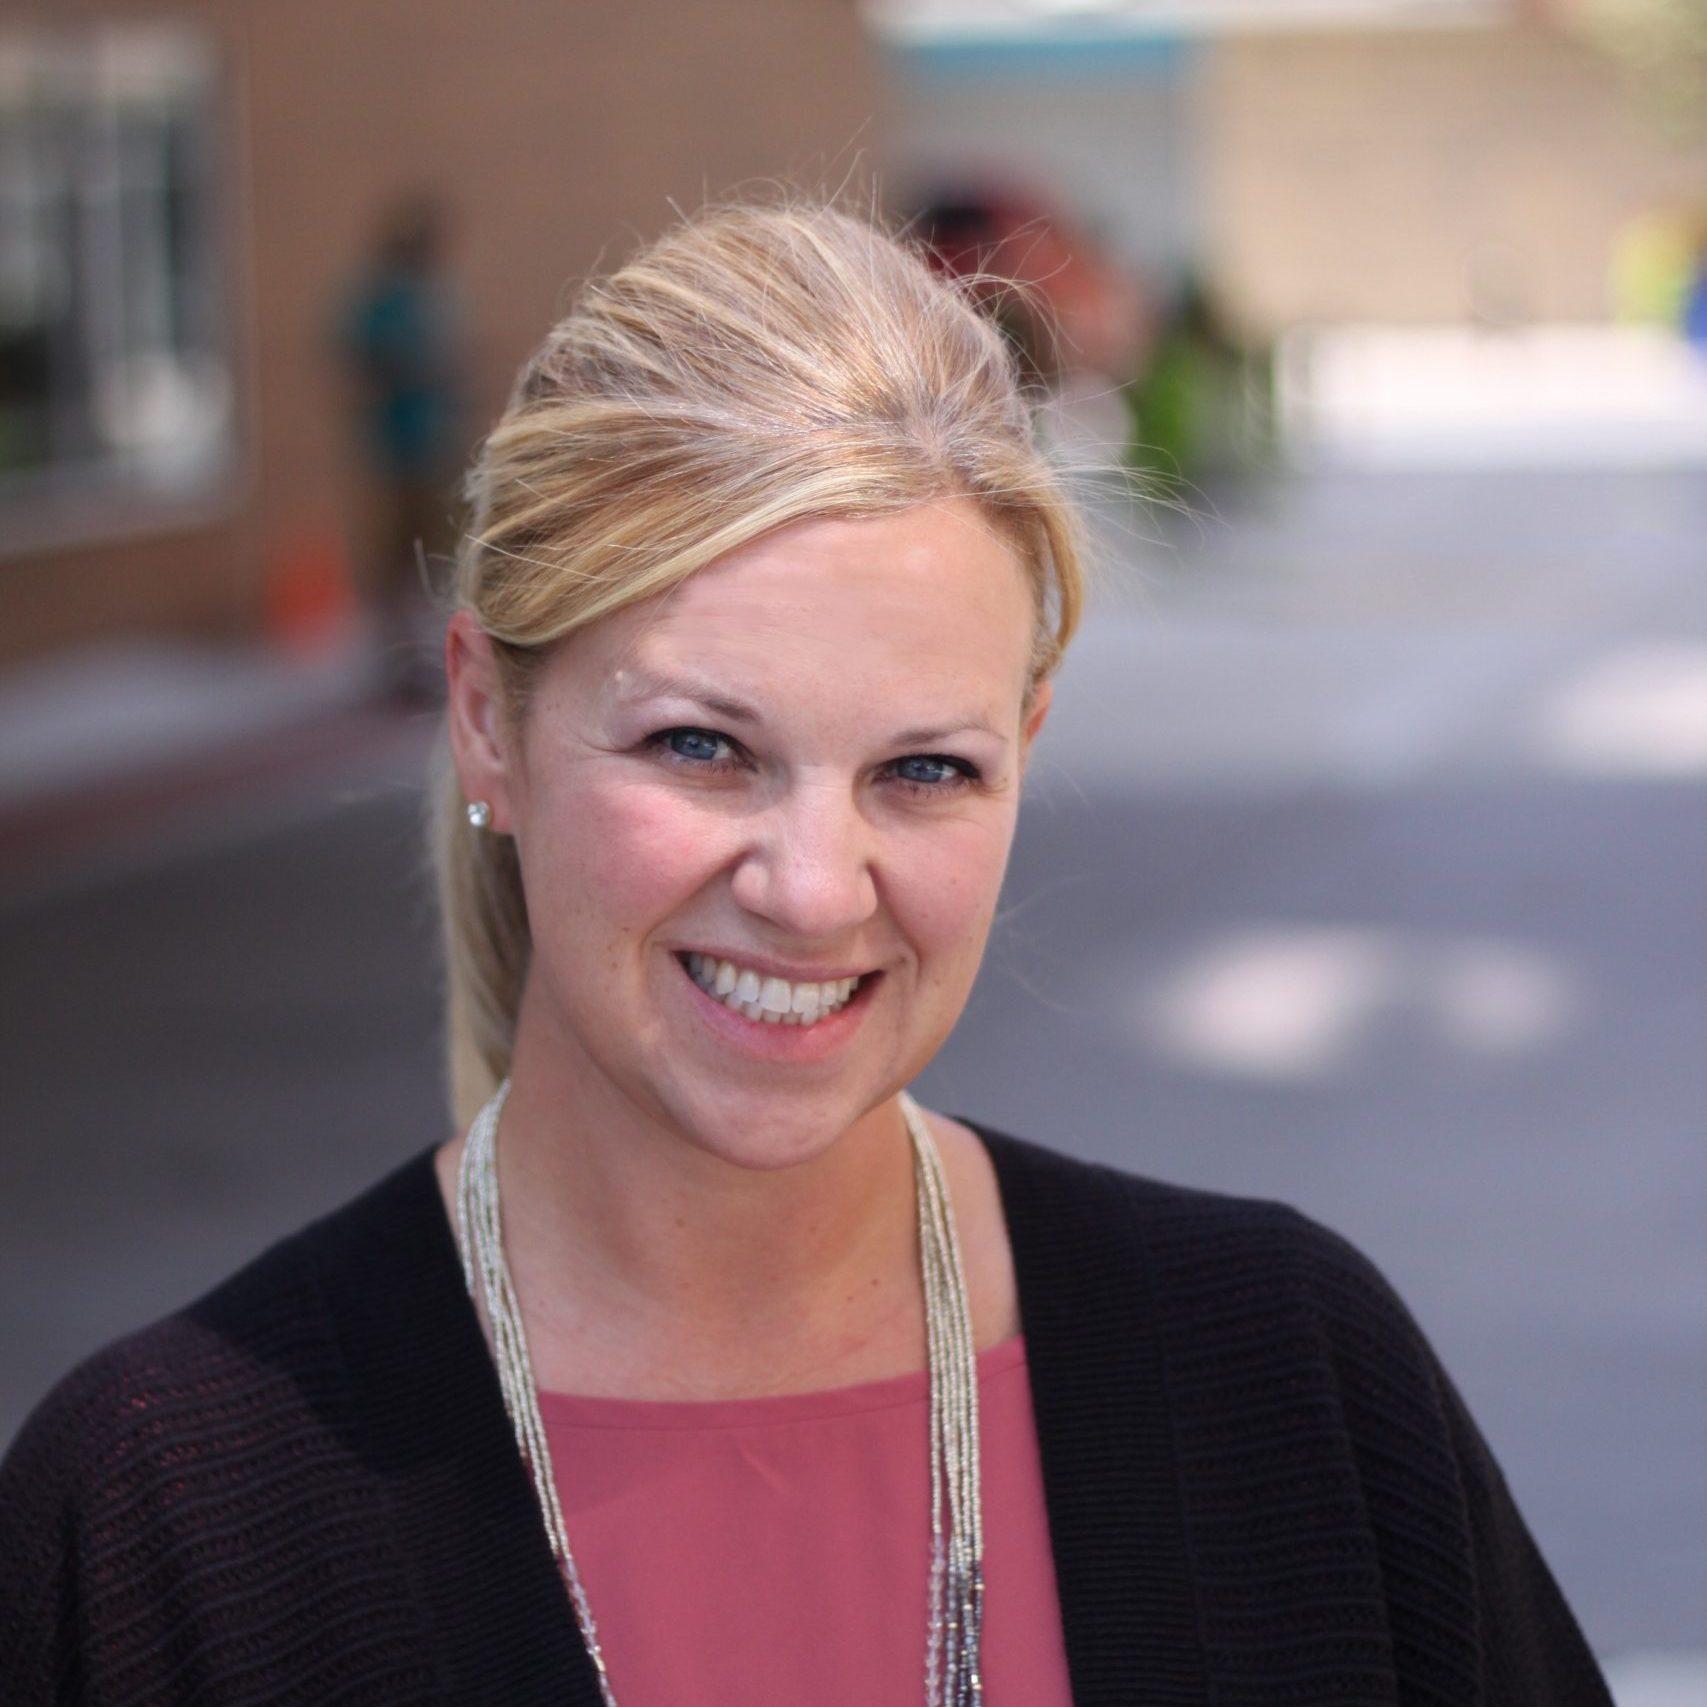 Heather Reed